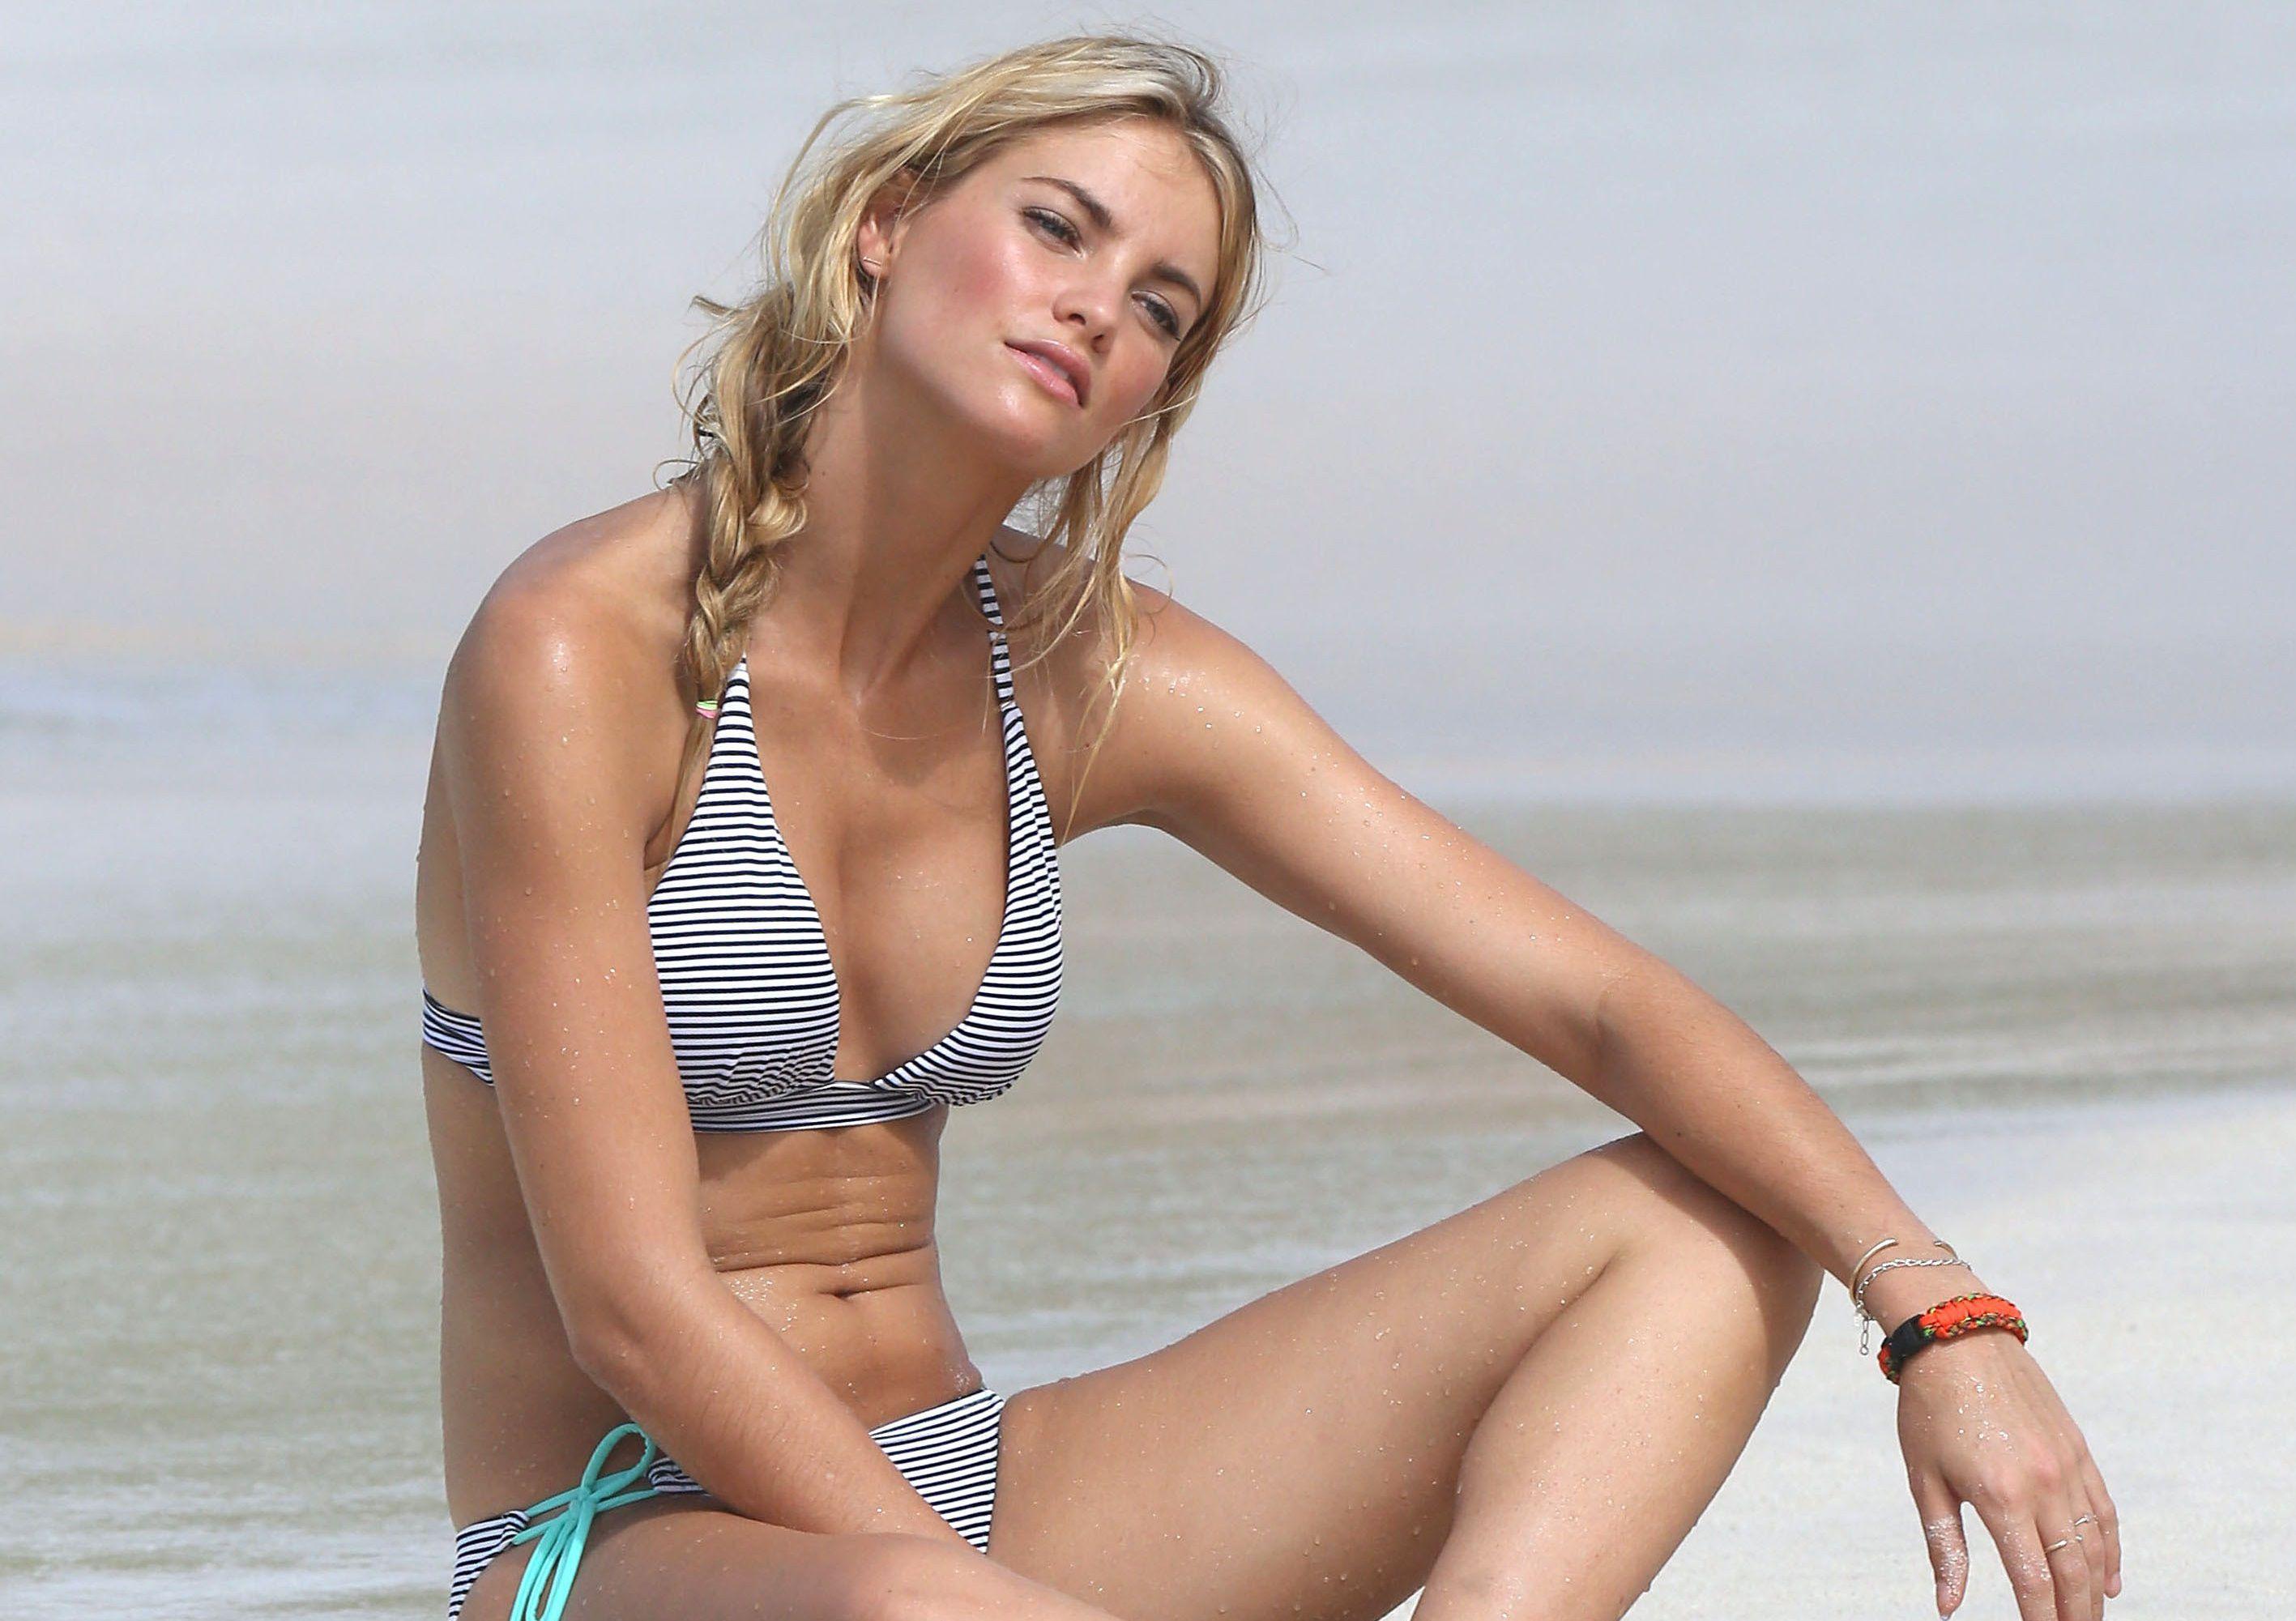 Cleavage Kendal Lee Schuler nude (48 photo), Tits, Hot, Boobs, panties 2020